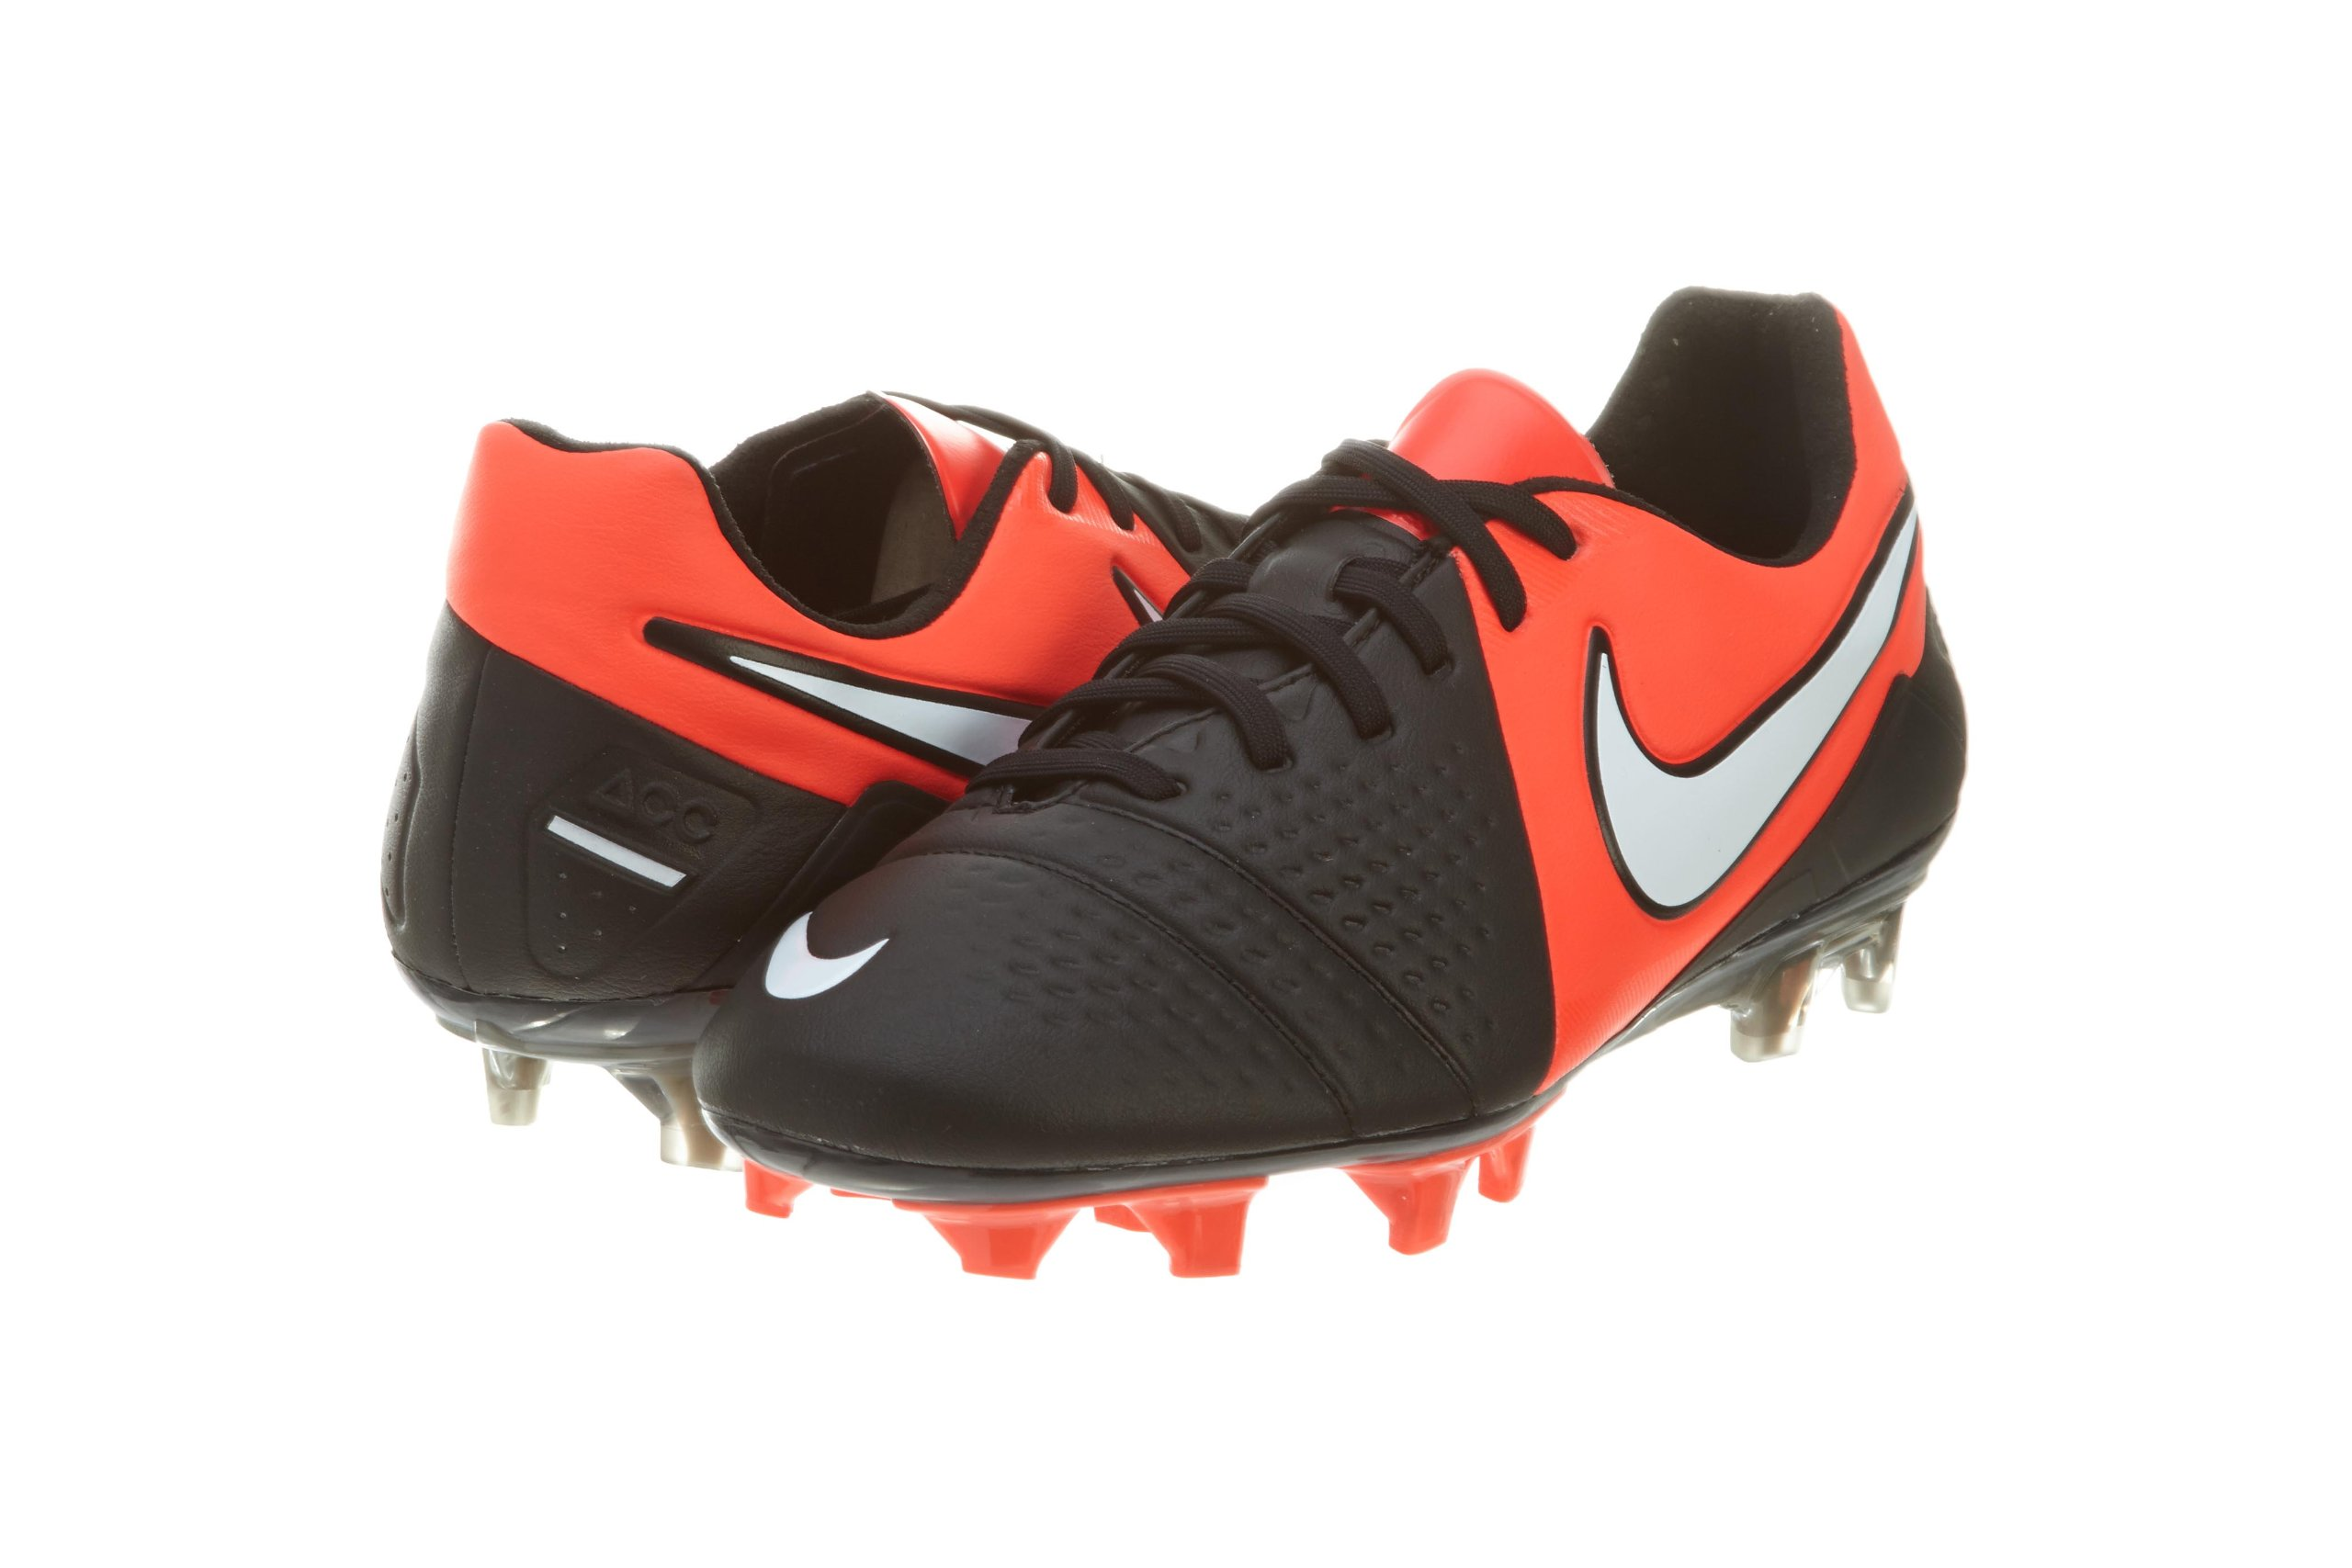 Nike Ctr 360 Maestri Iii Fg Mens525166 Style: 525166-016 Size: 7 by NIKE